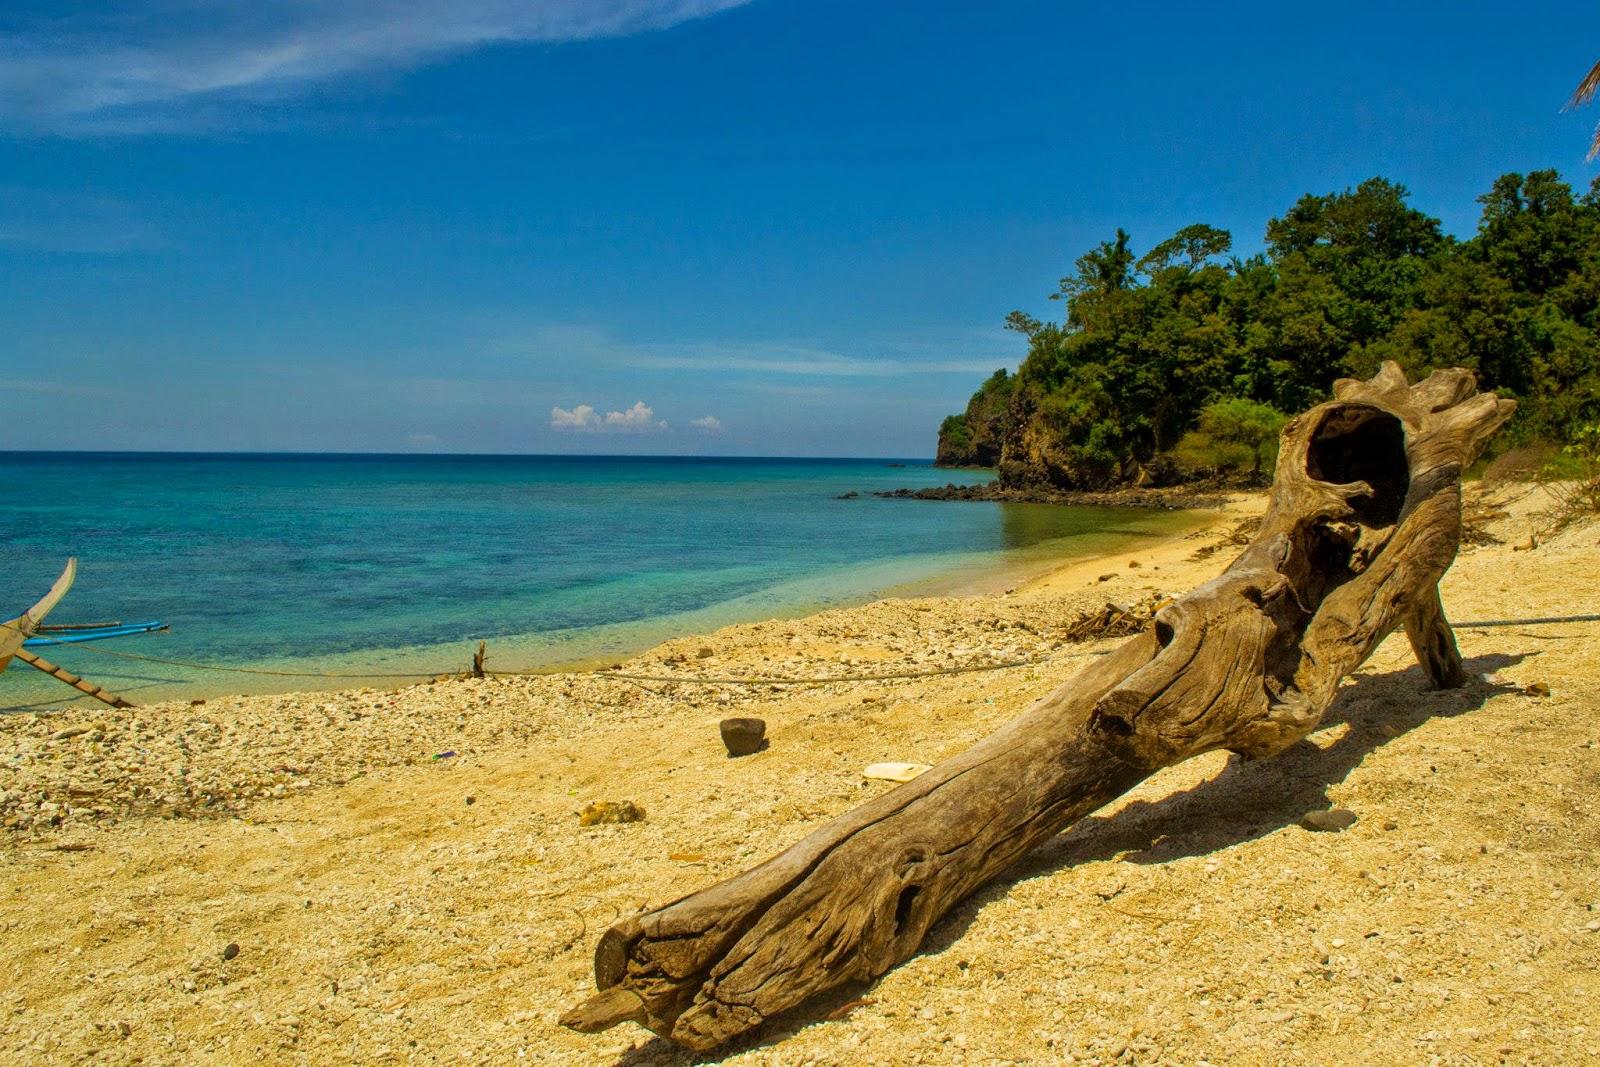 Oscar Island